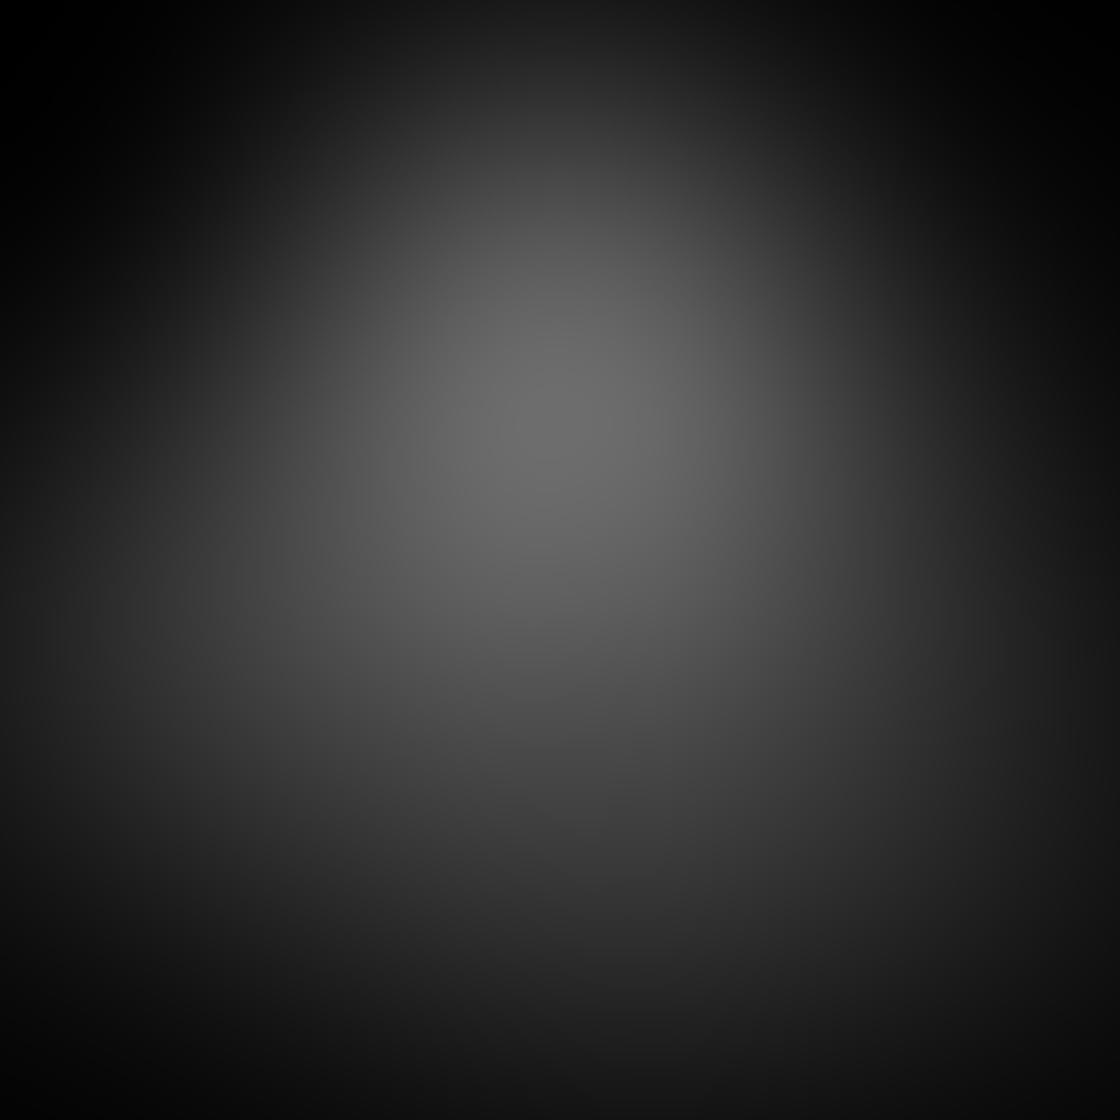 Shadow iPhone Photos 15